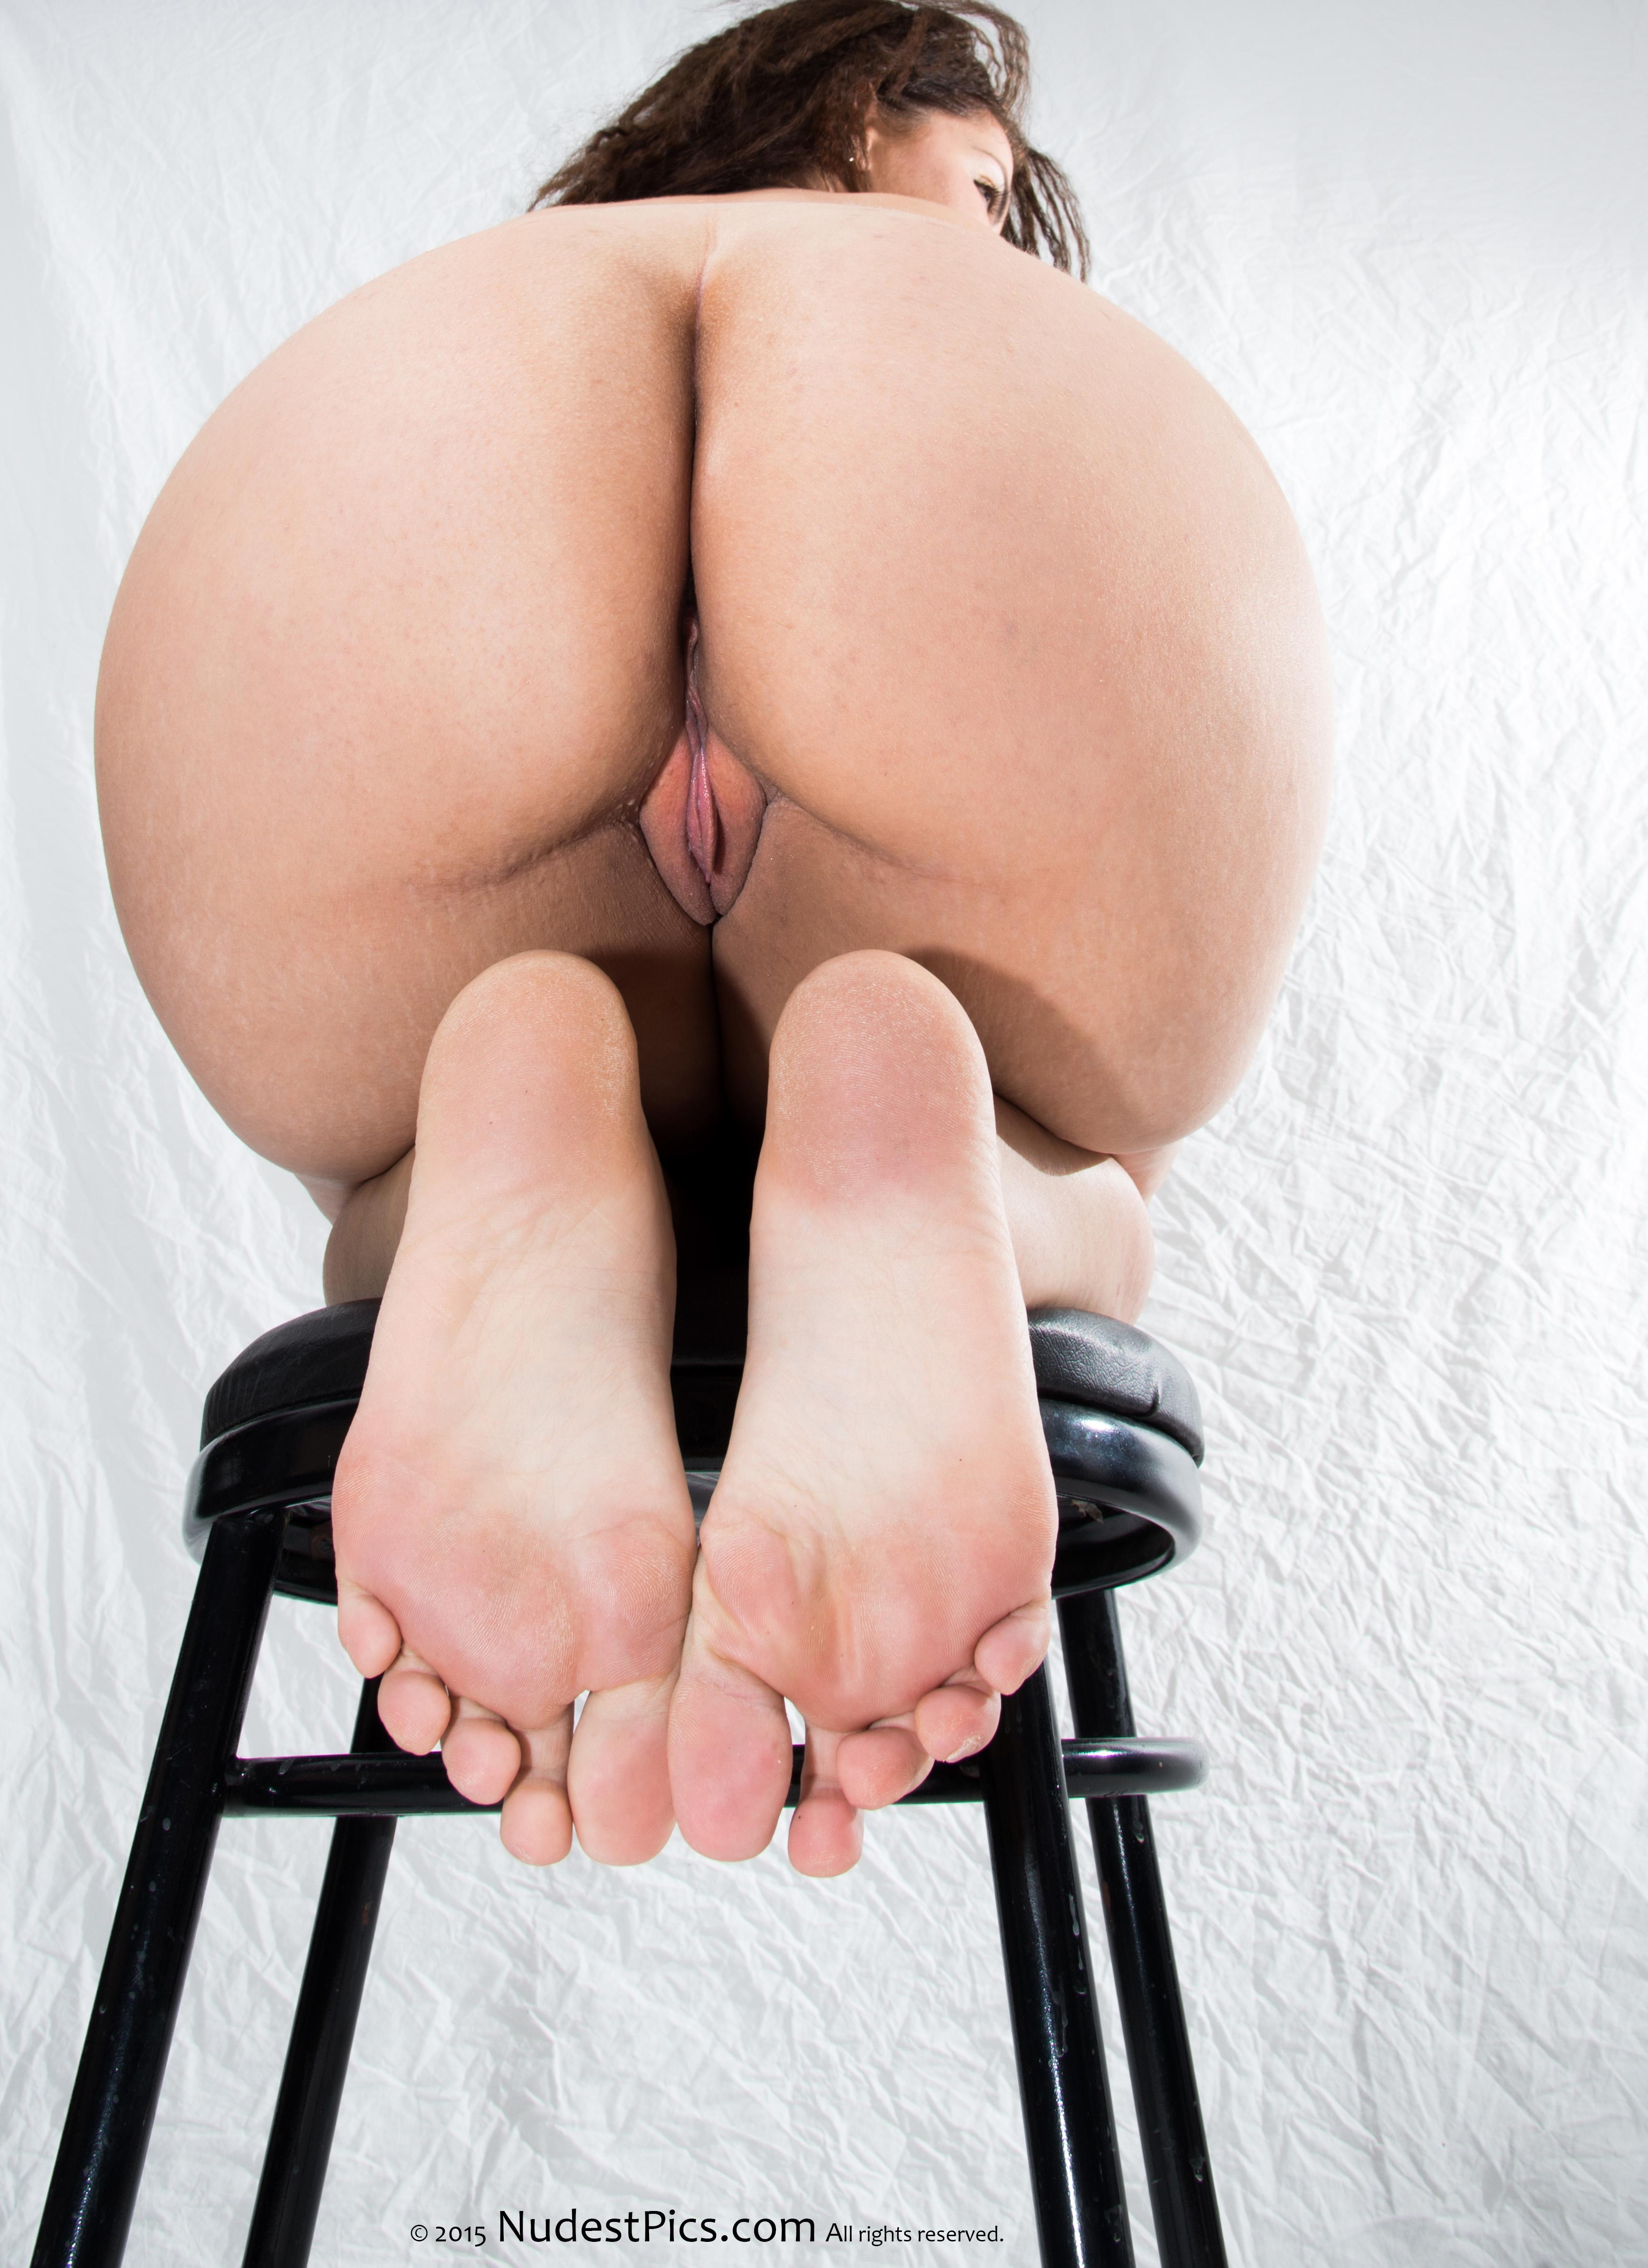 Erotic nude art prints